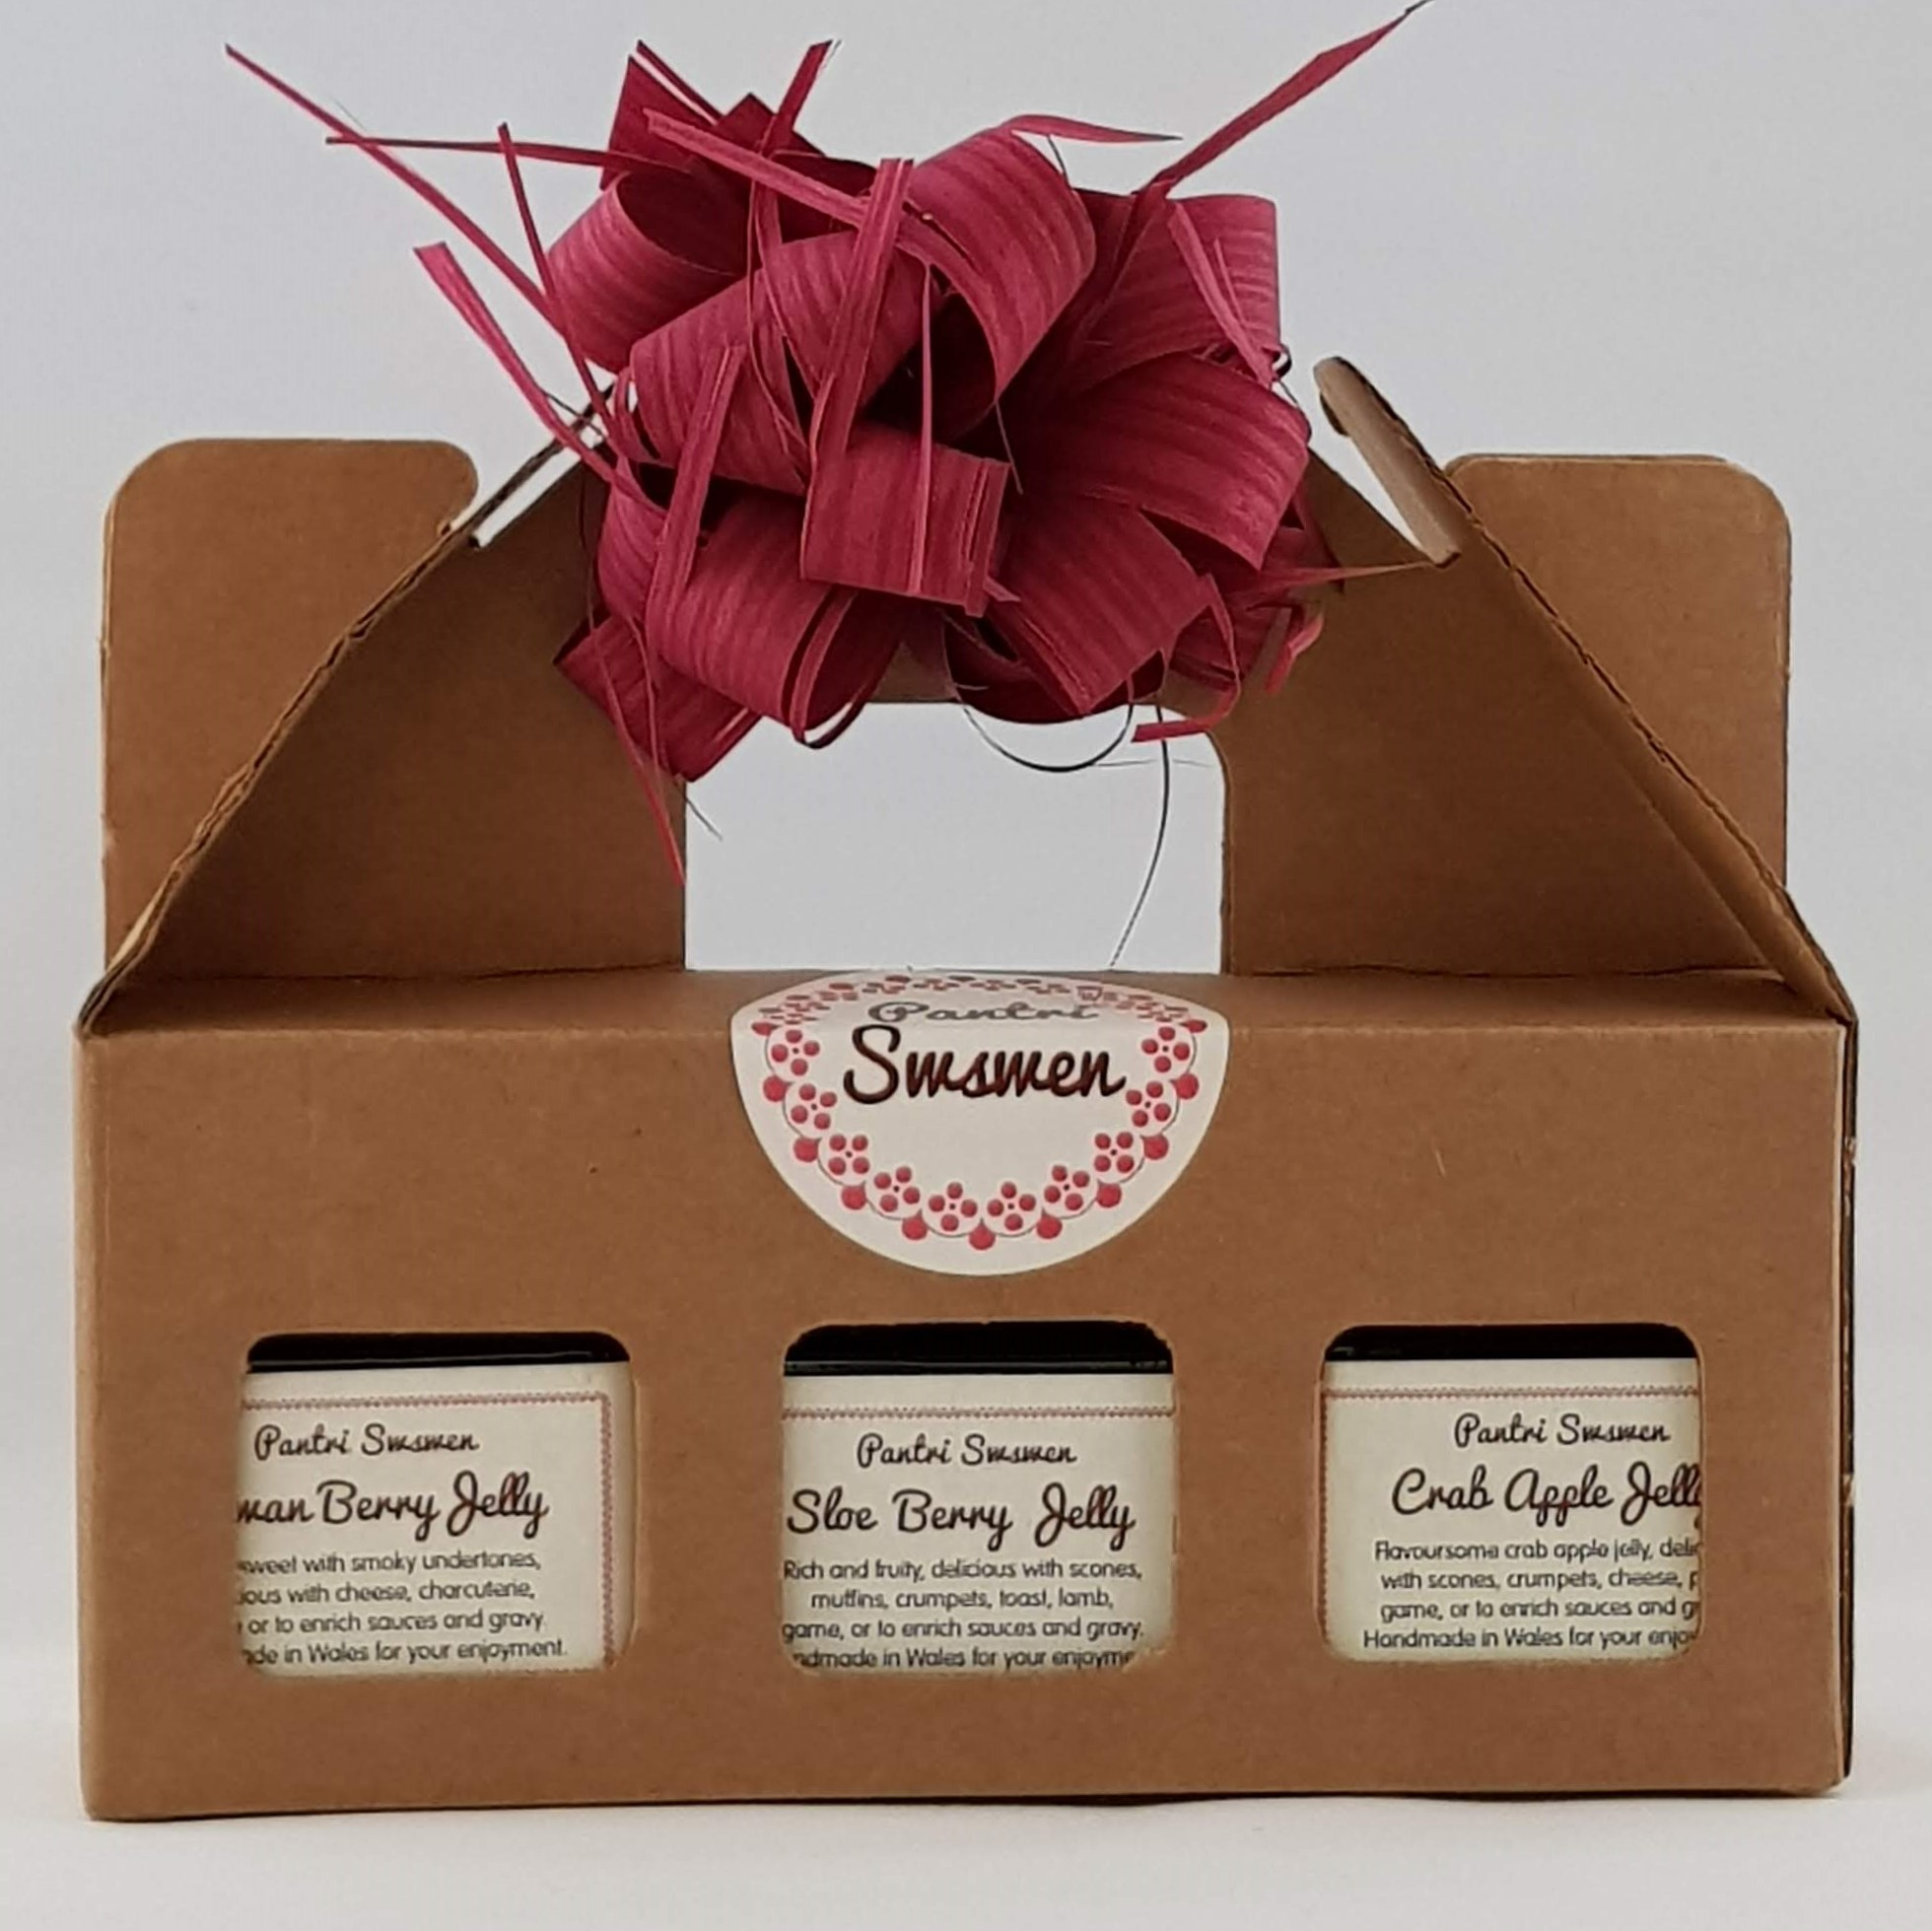 Pantri Swswen Sweet Preserves Multi Pack